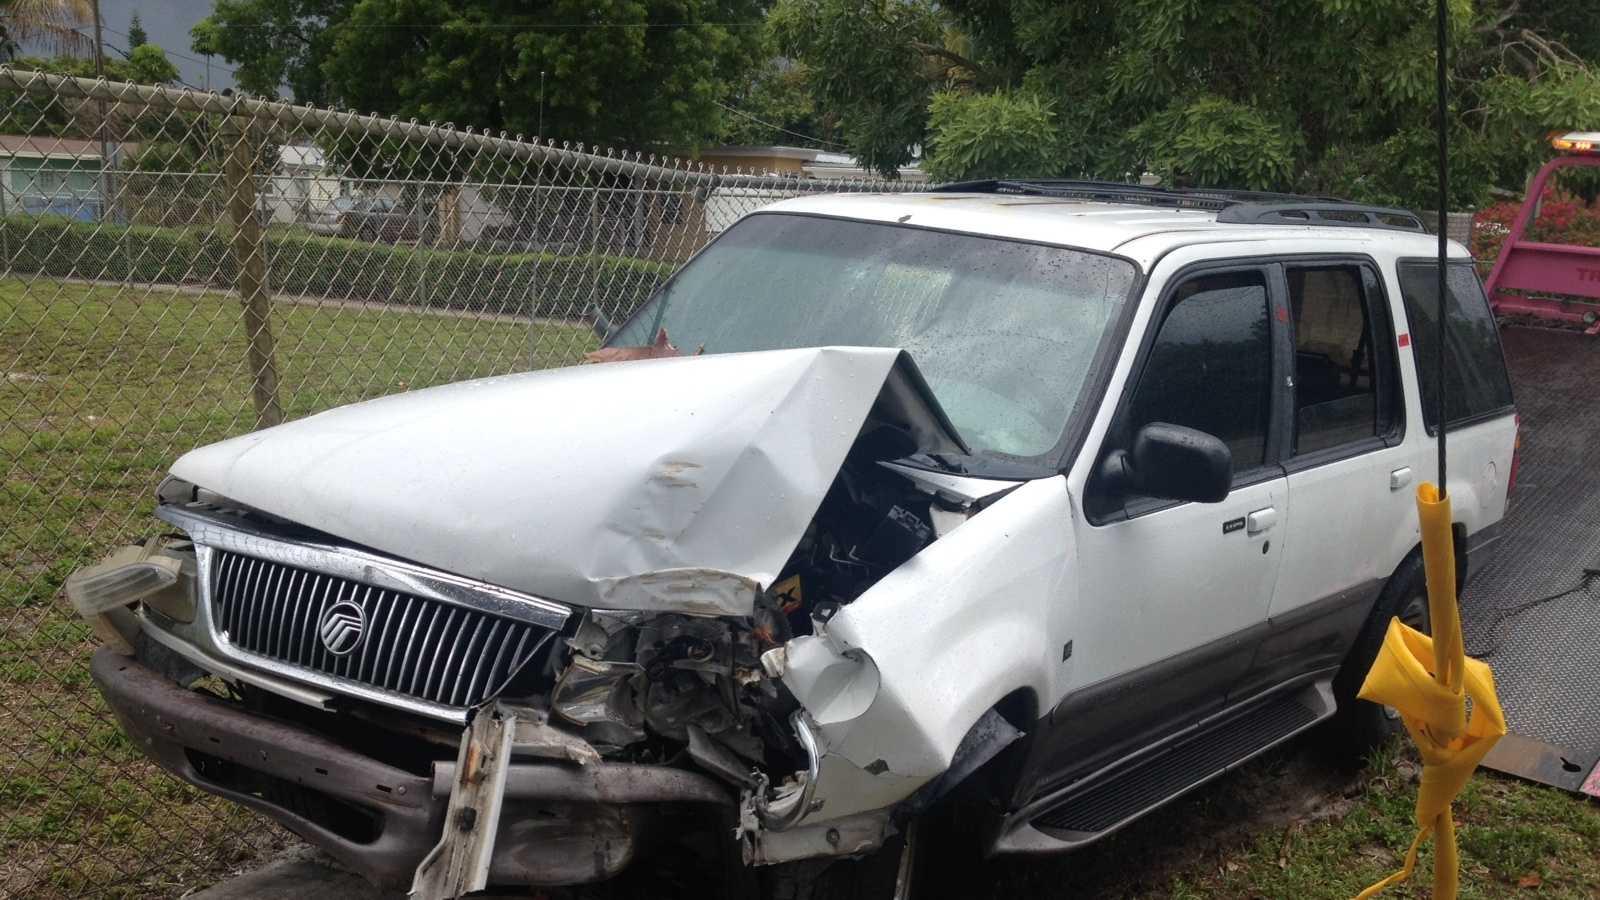 Home burglary crashed SUV